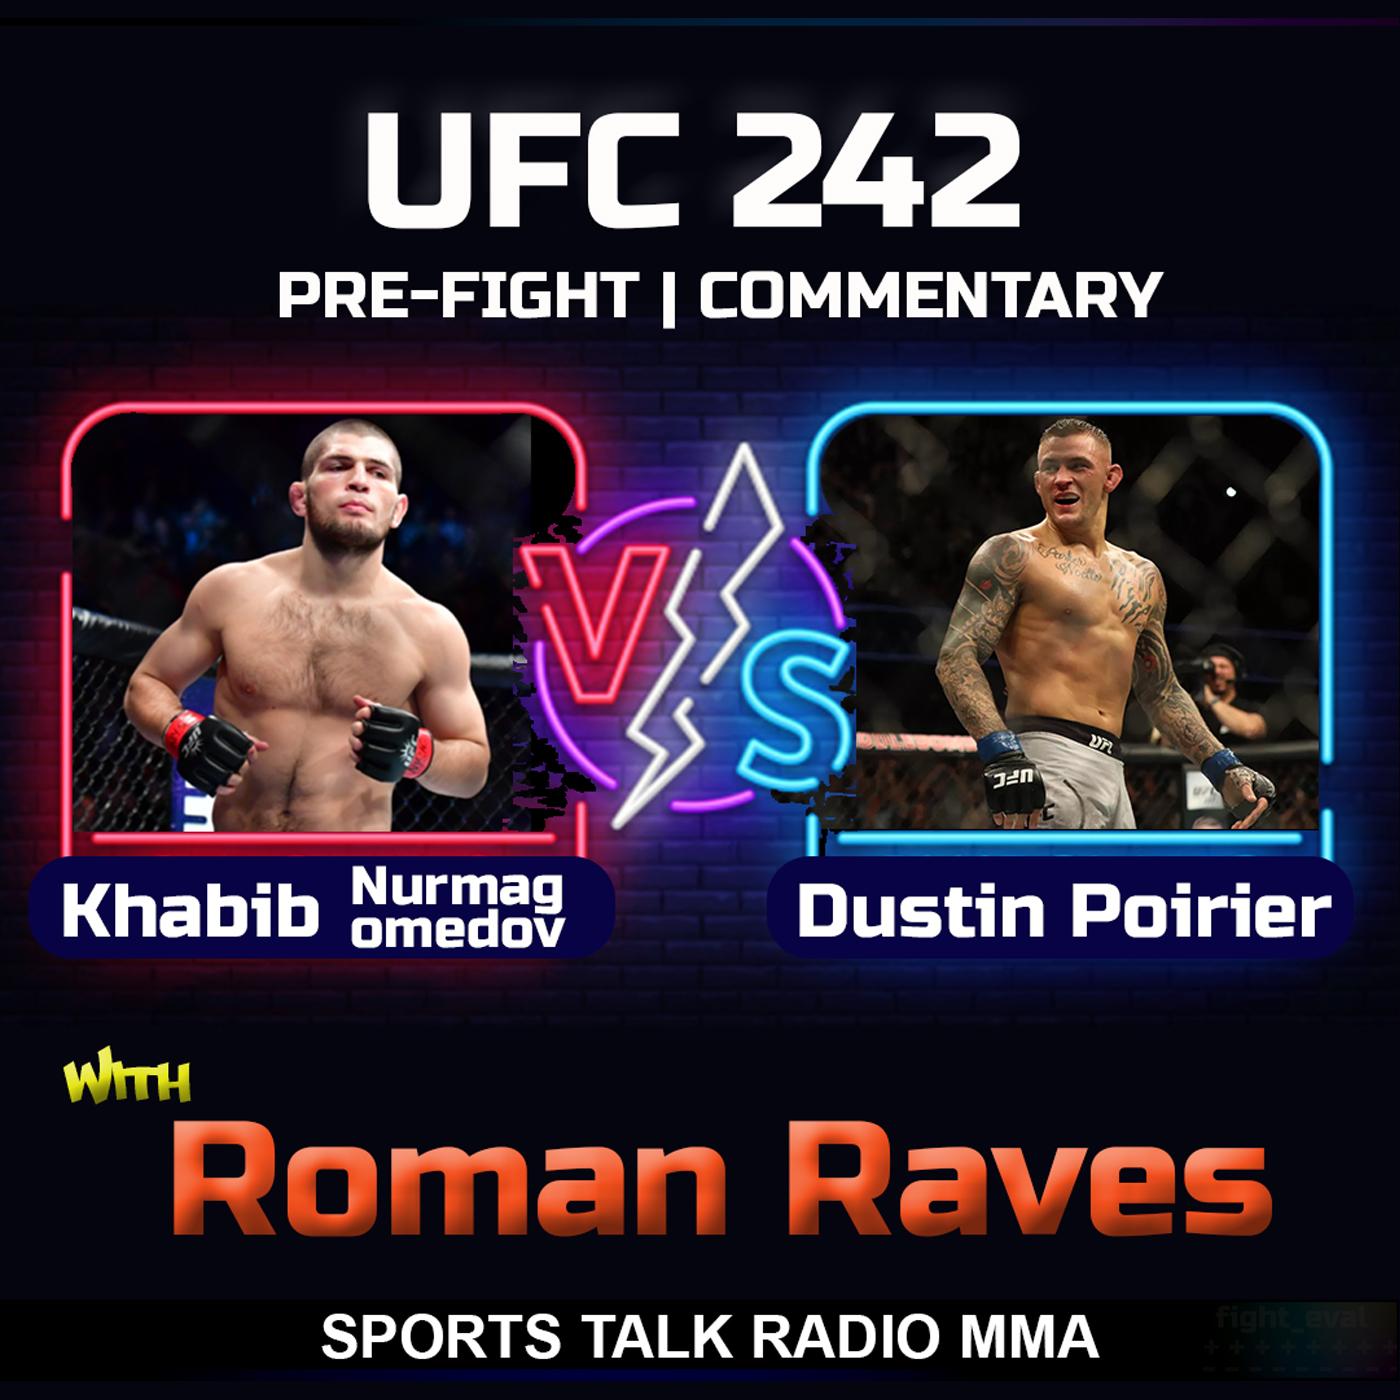 Artwork for Khabib Nurmagomedov vs Dustin Poirier UFC 242 Sports Talk Radio MMA